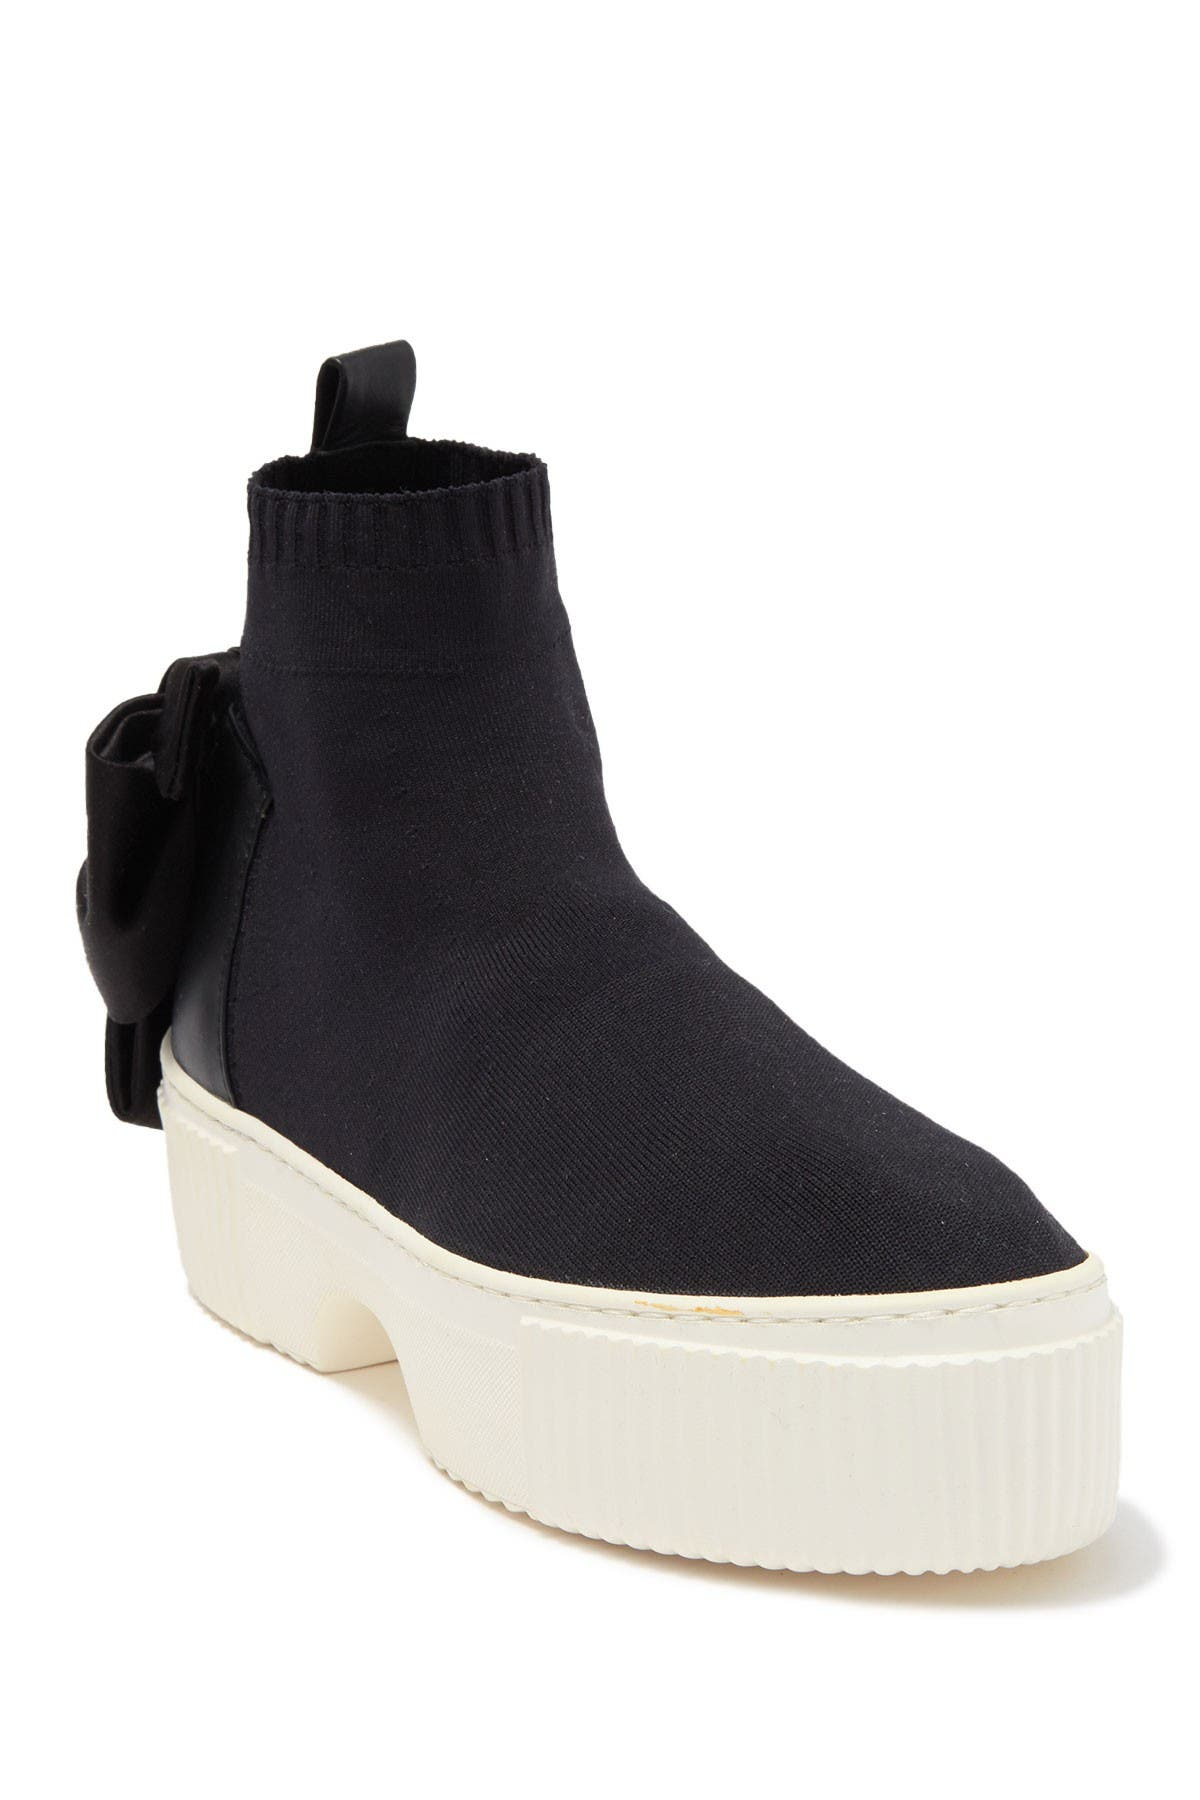 Image of AGL Platform Sock Cuff Sneaker